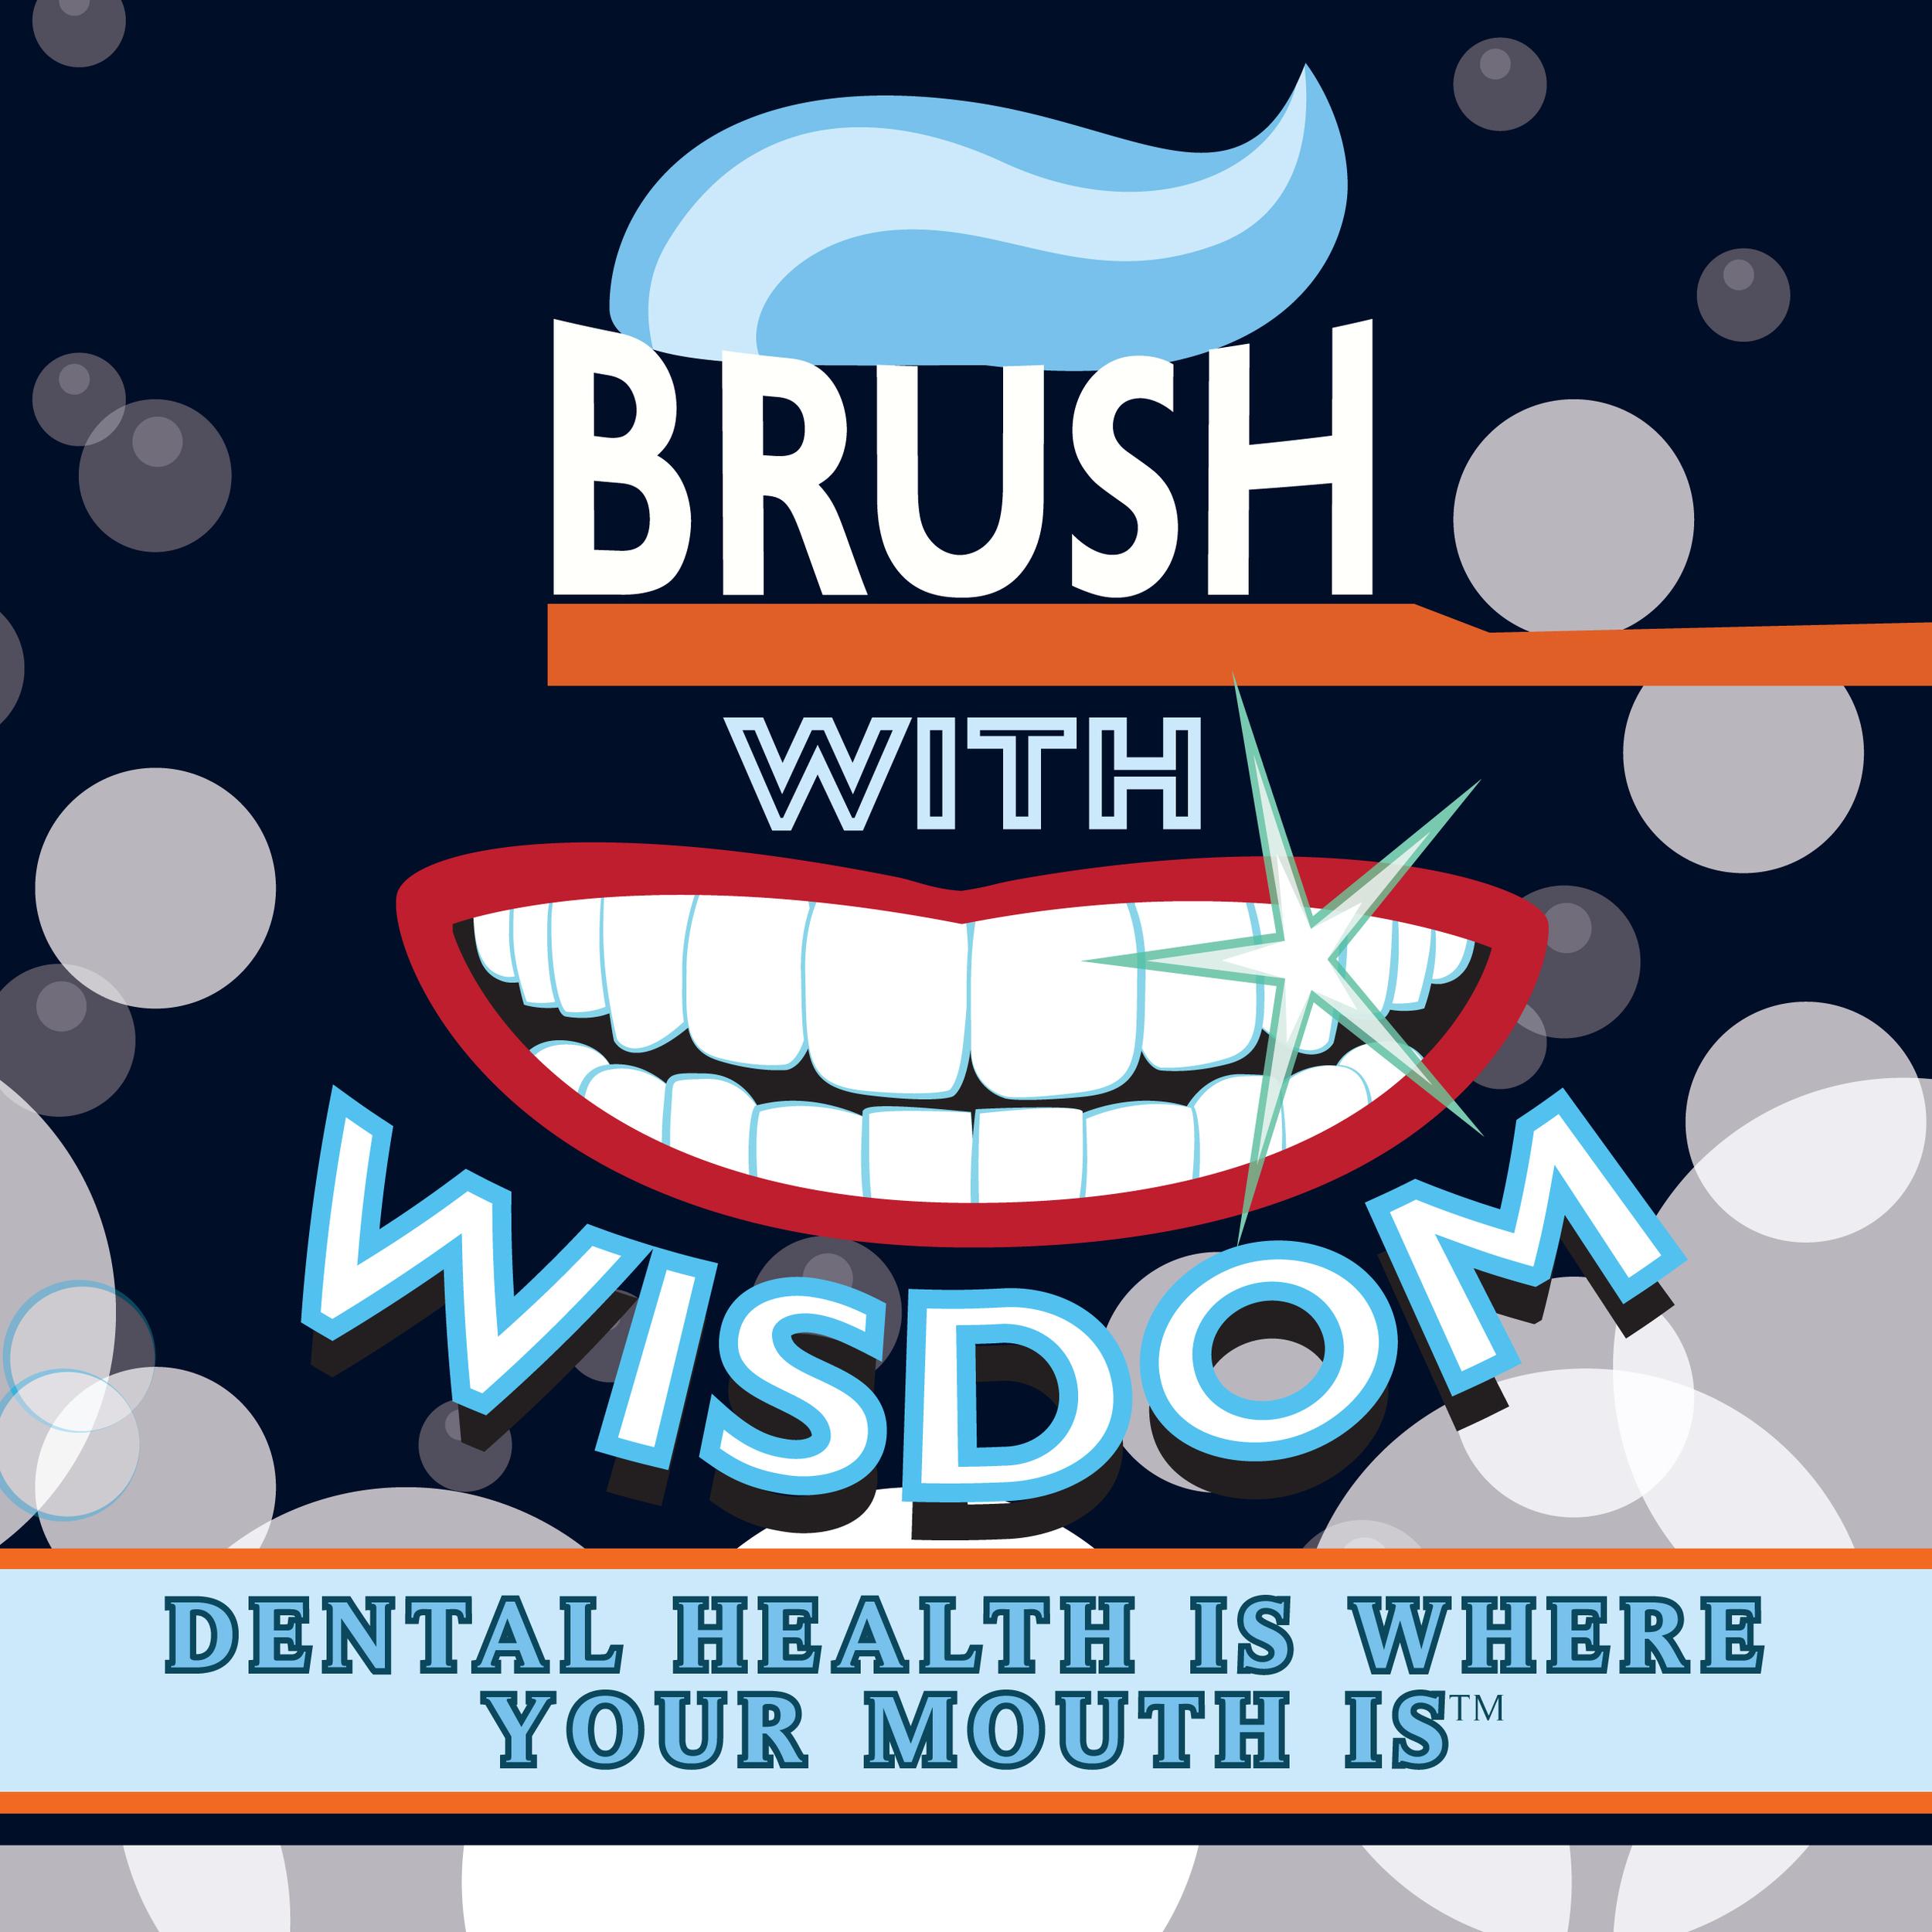 BRUSH WITH WISDOM